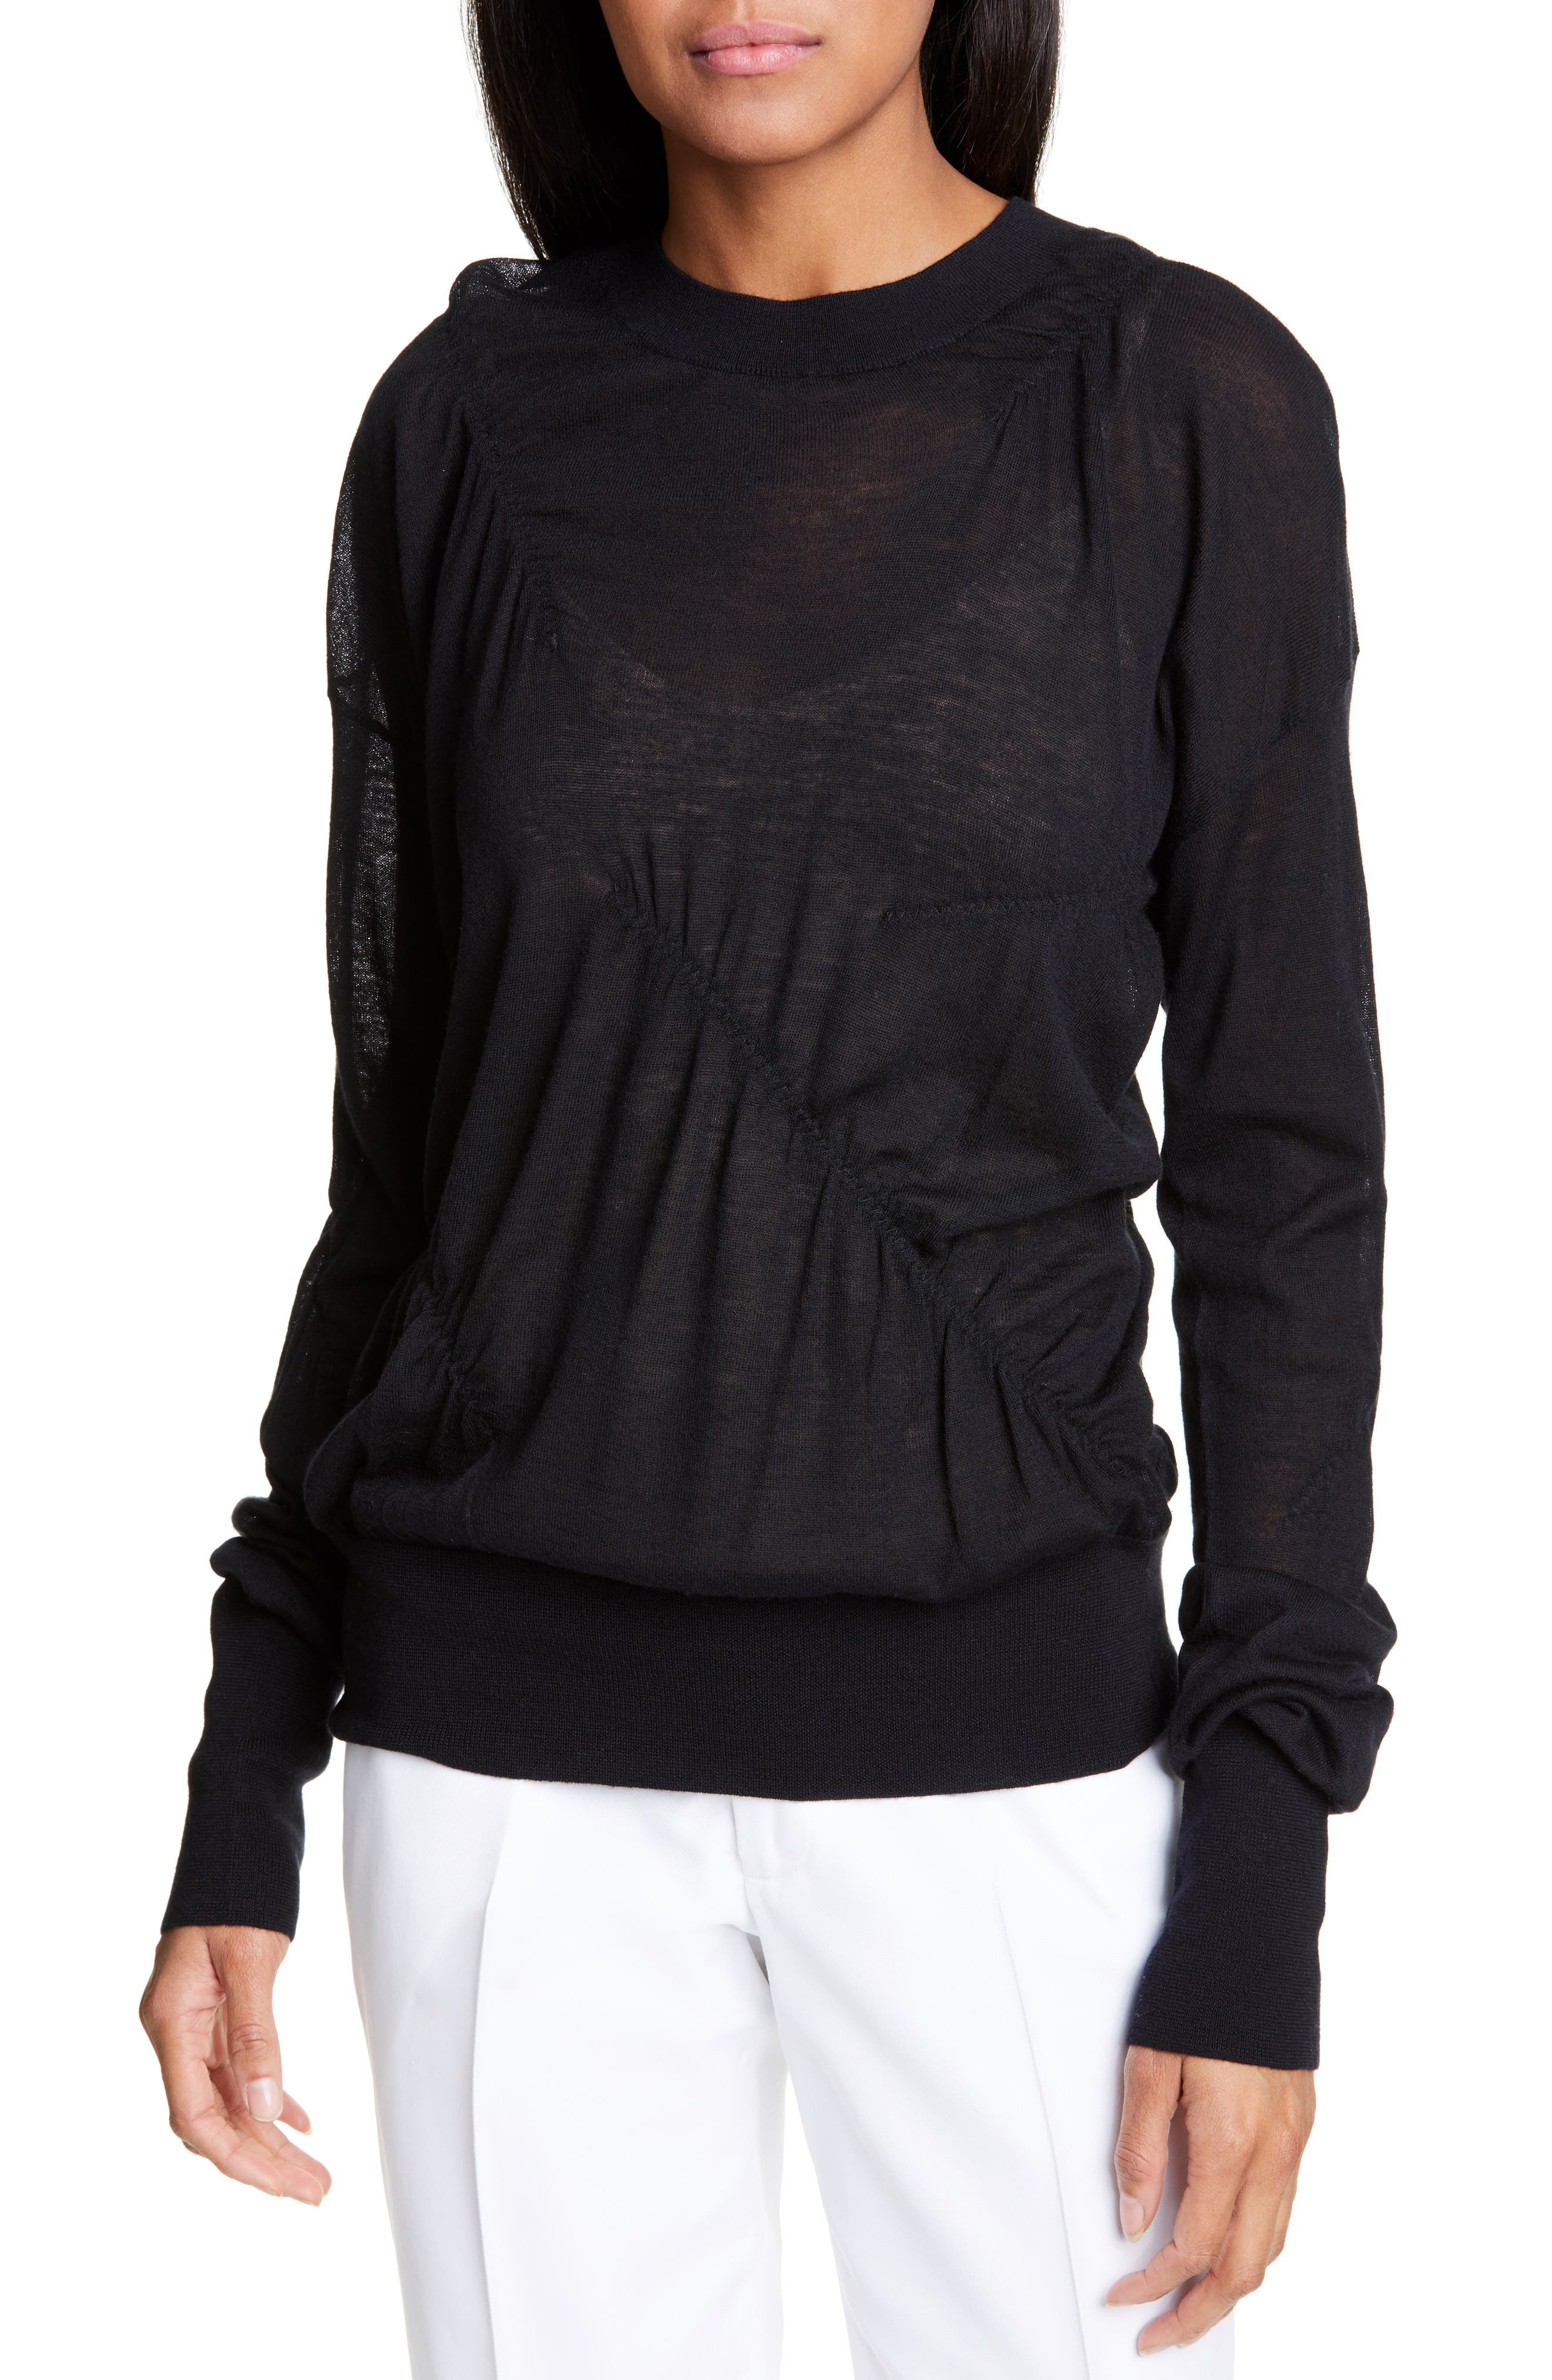 HELMUT LANG, Ruched Seam Detail Cashmere Sweater, Main thumbnail 1, color, BLACK